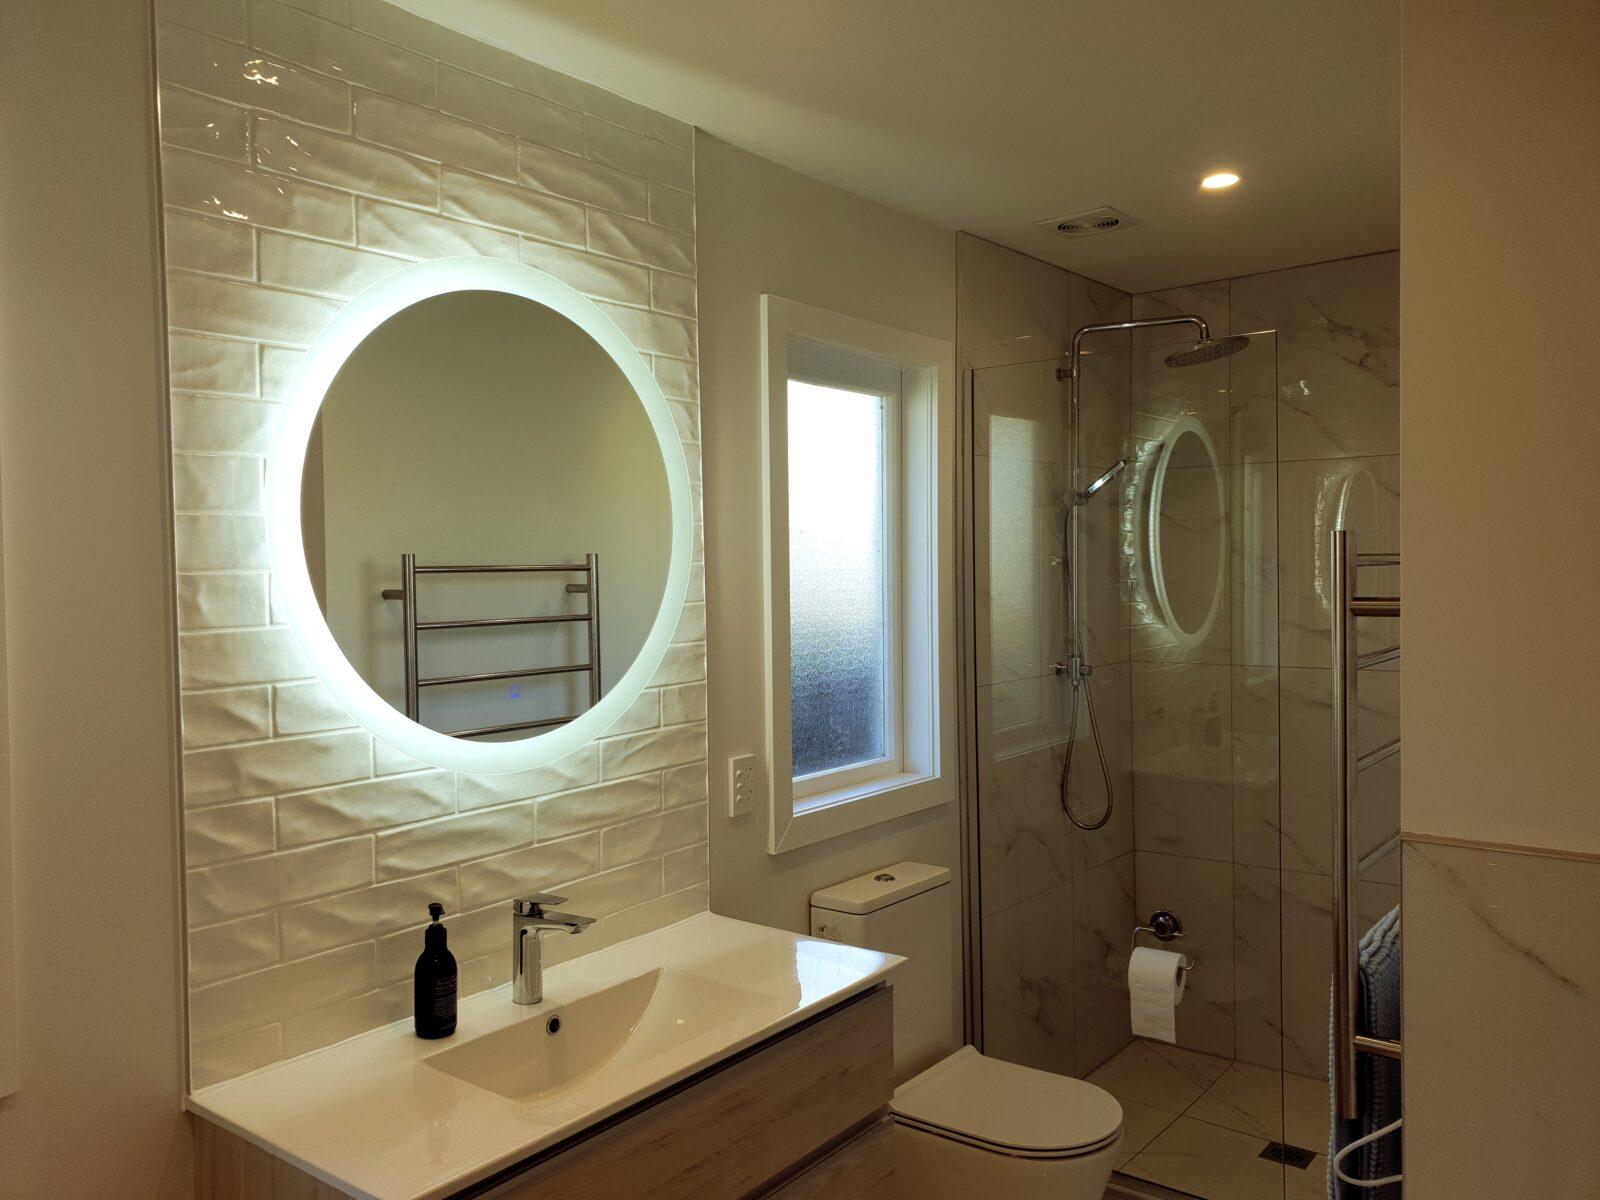 bathroom with round mirror